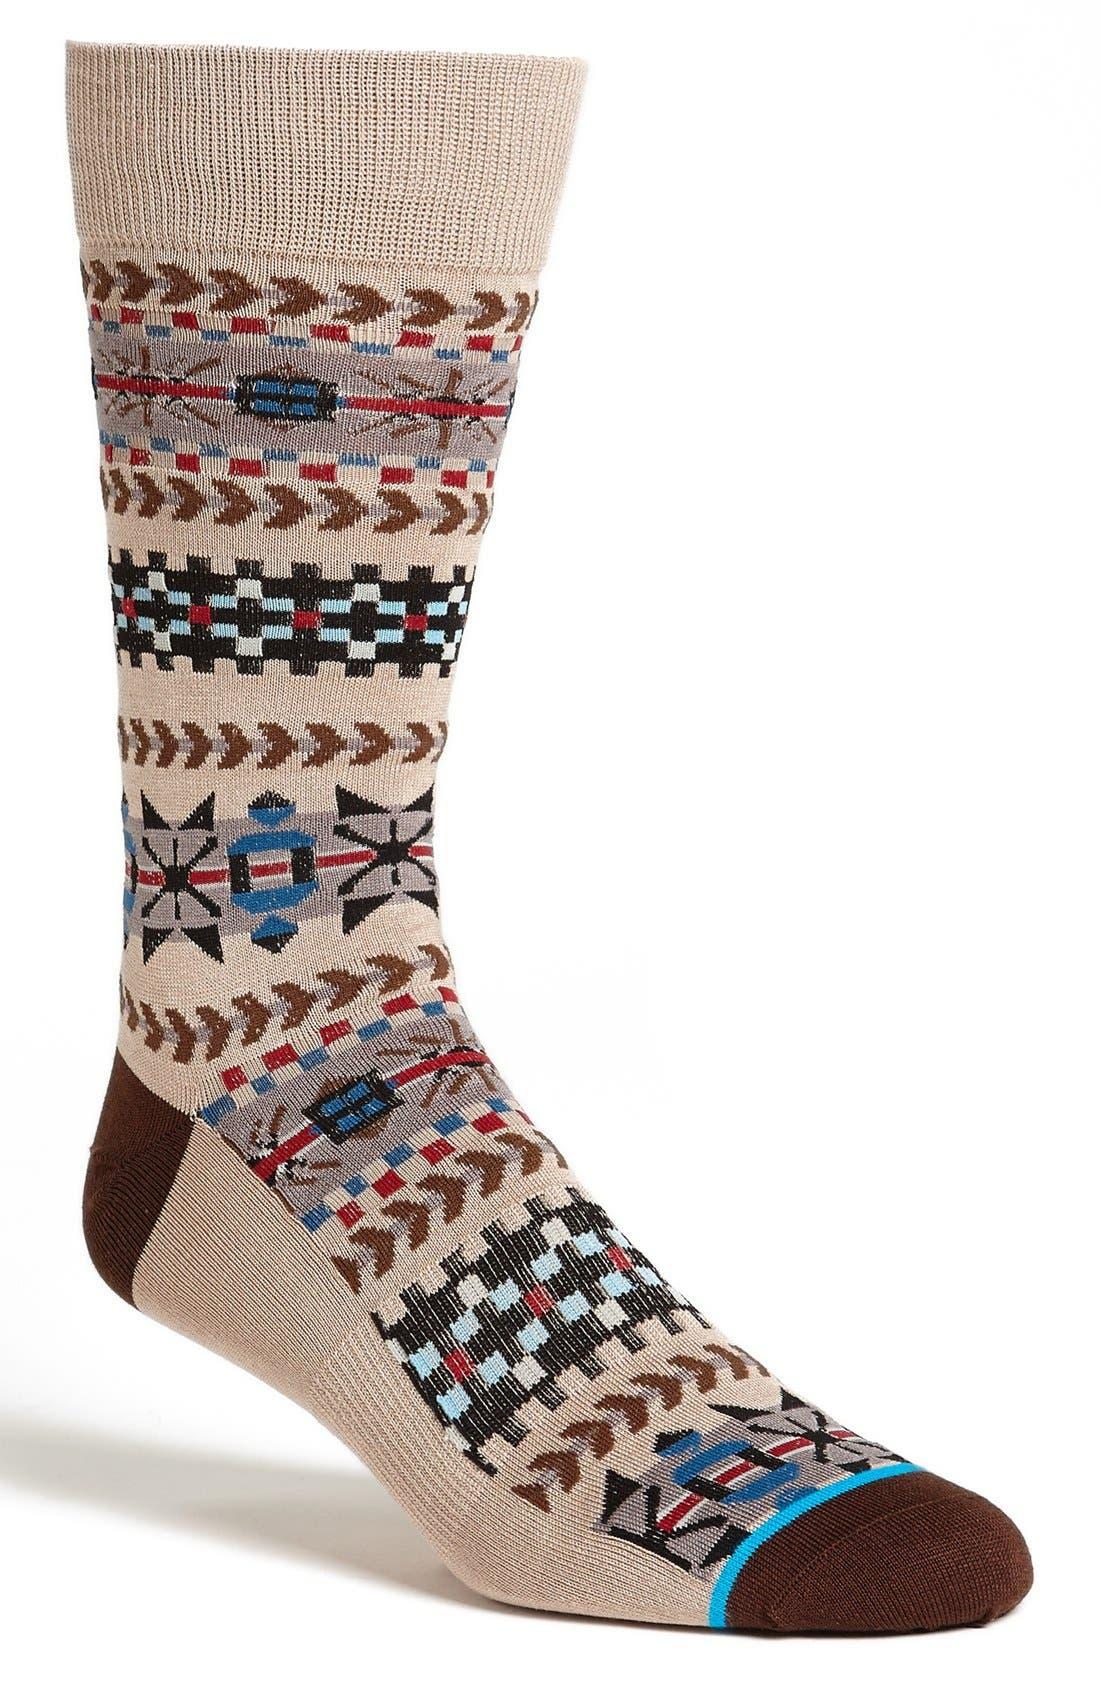 Main Image - Stance 'Hayes' Dress Socks